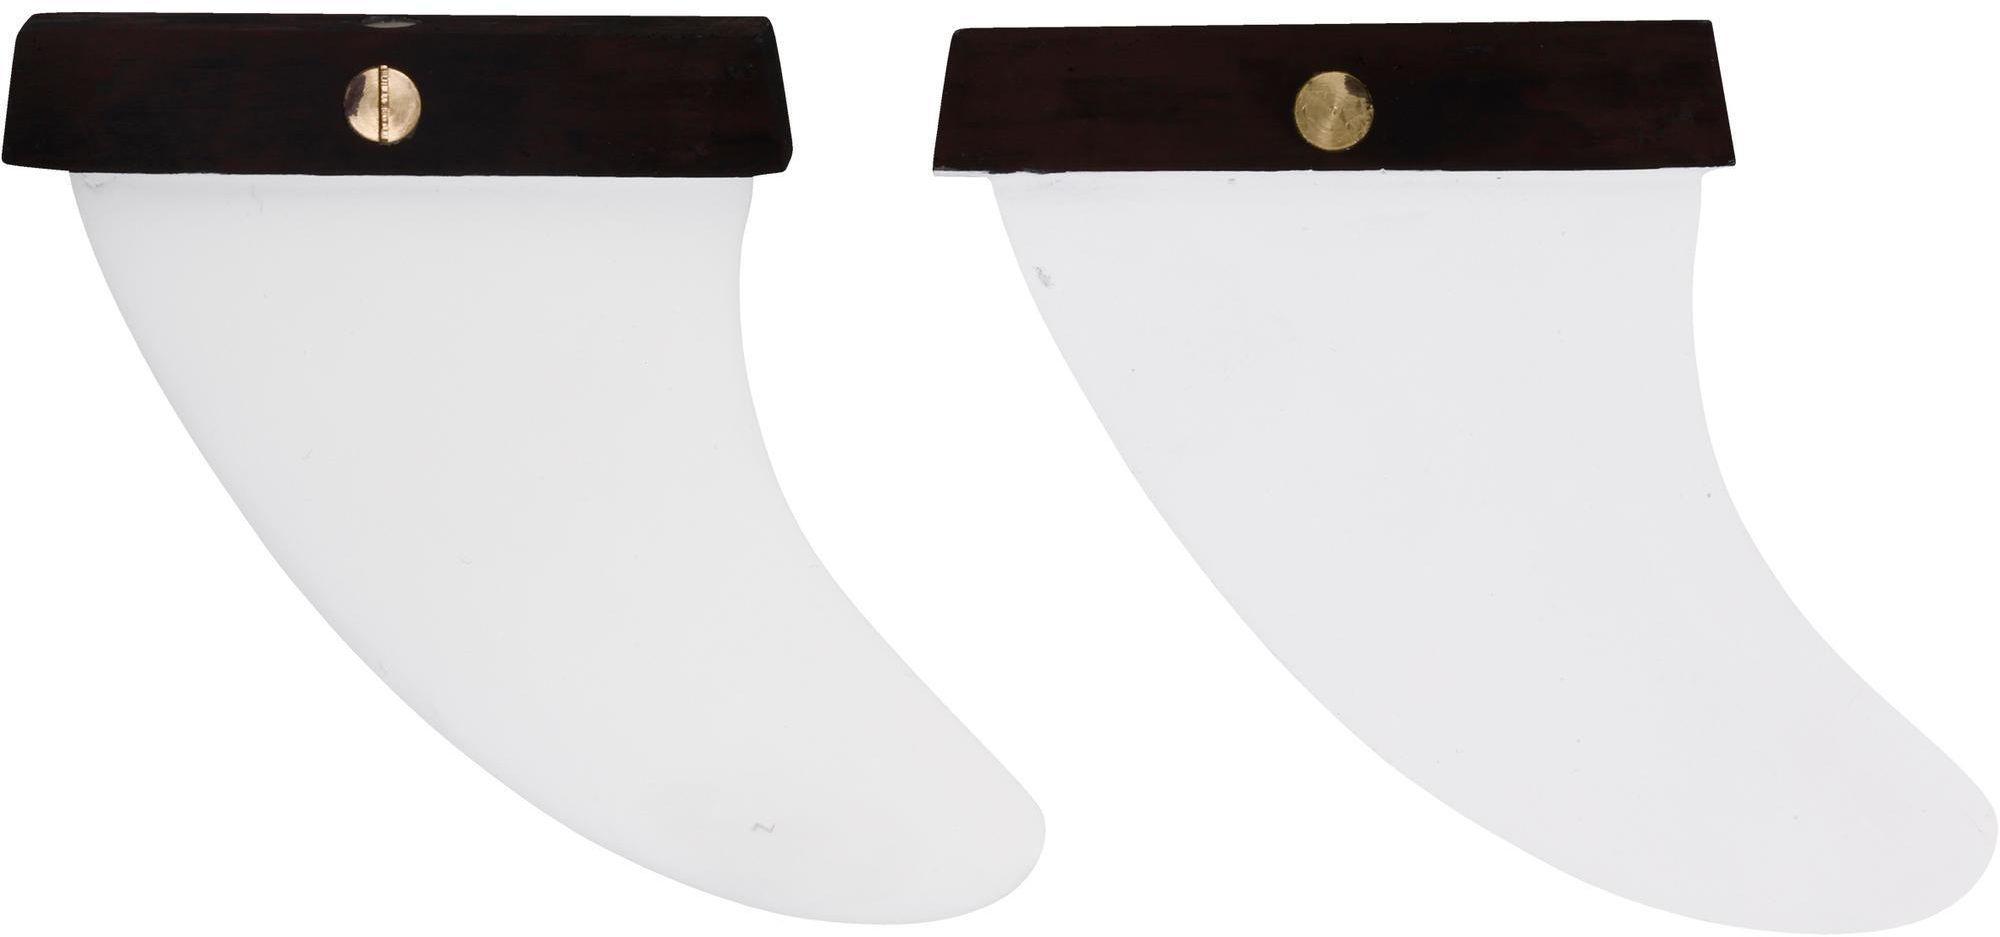 Stateczniki Boczne Do Deski Stand Up Paddle I Longboard